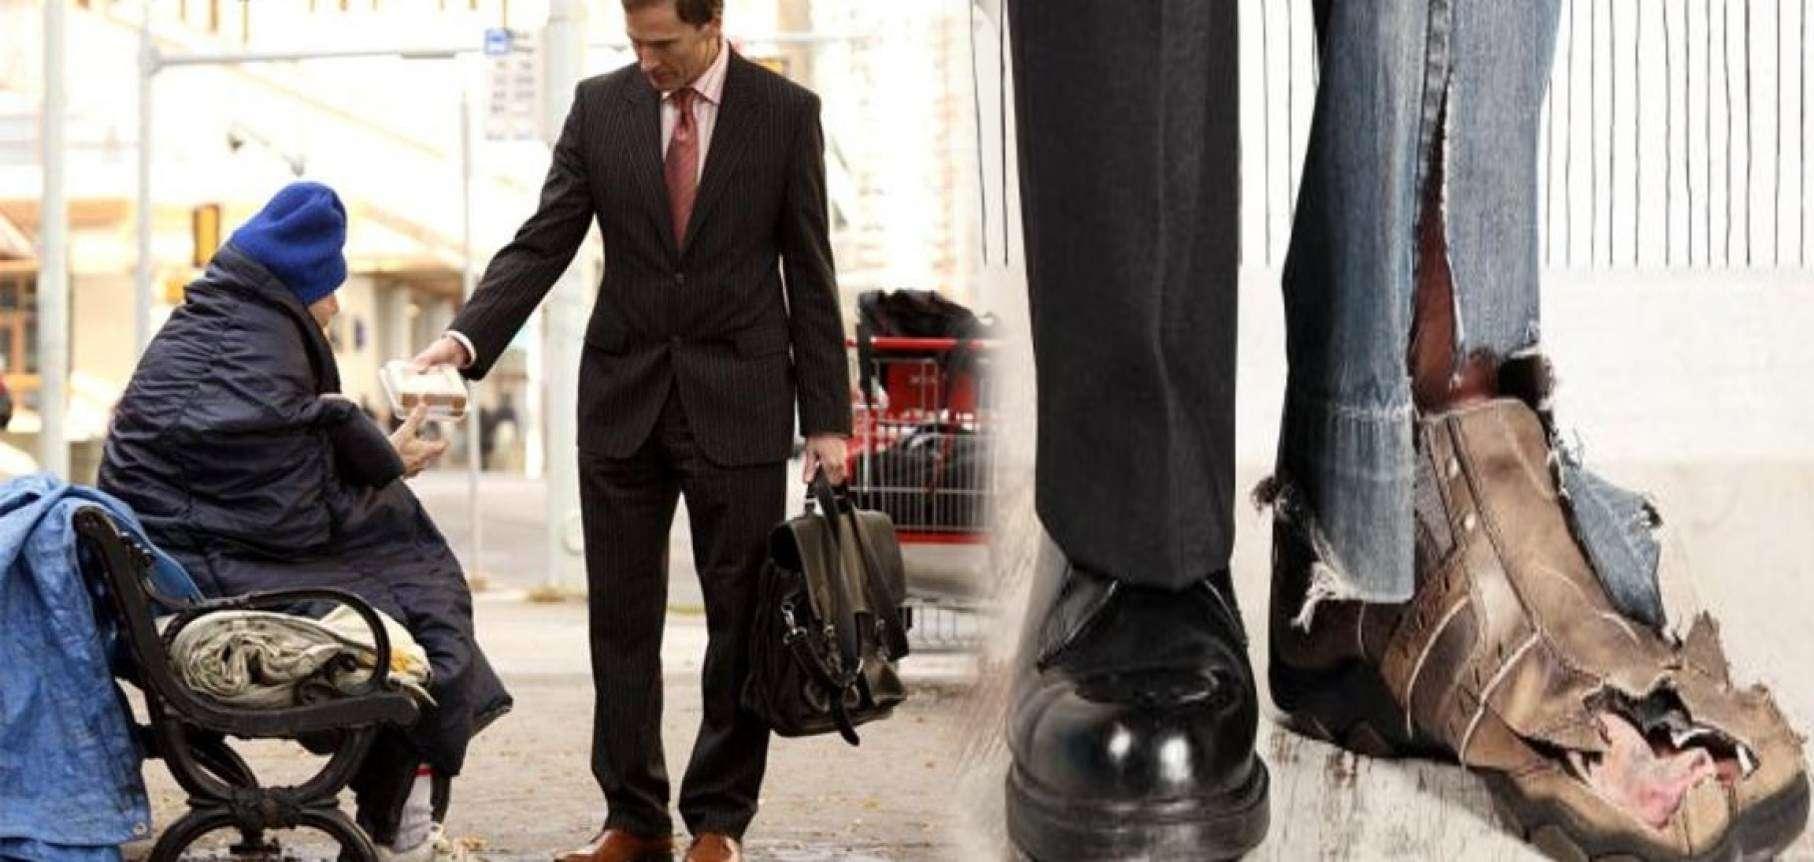 header ΗΠΑ Περισσότεροι οι δισεκατομμυριούχοι και οι φτωχοί